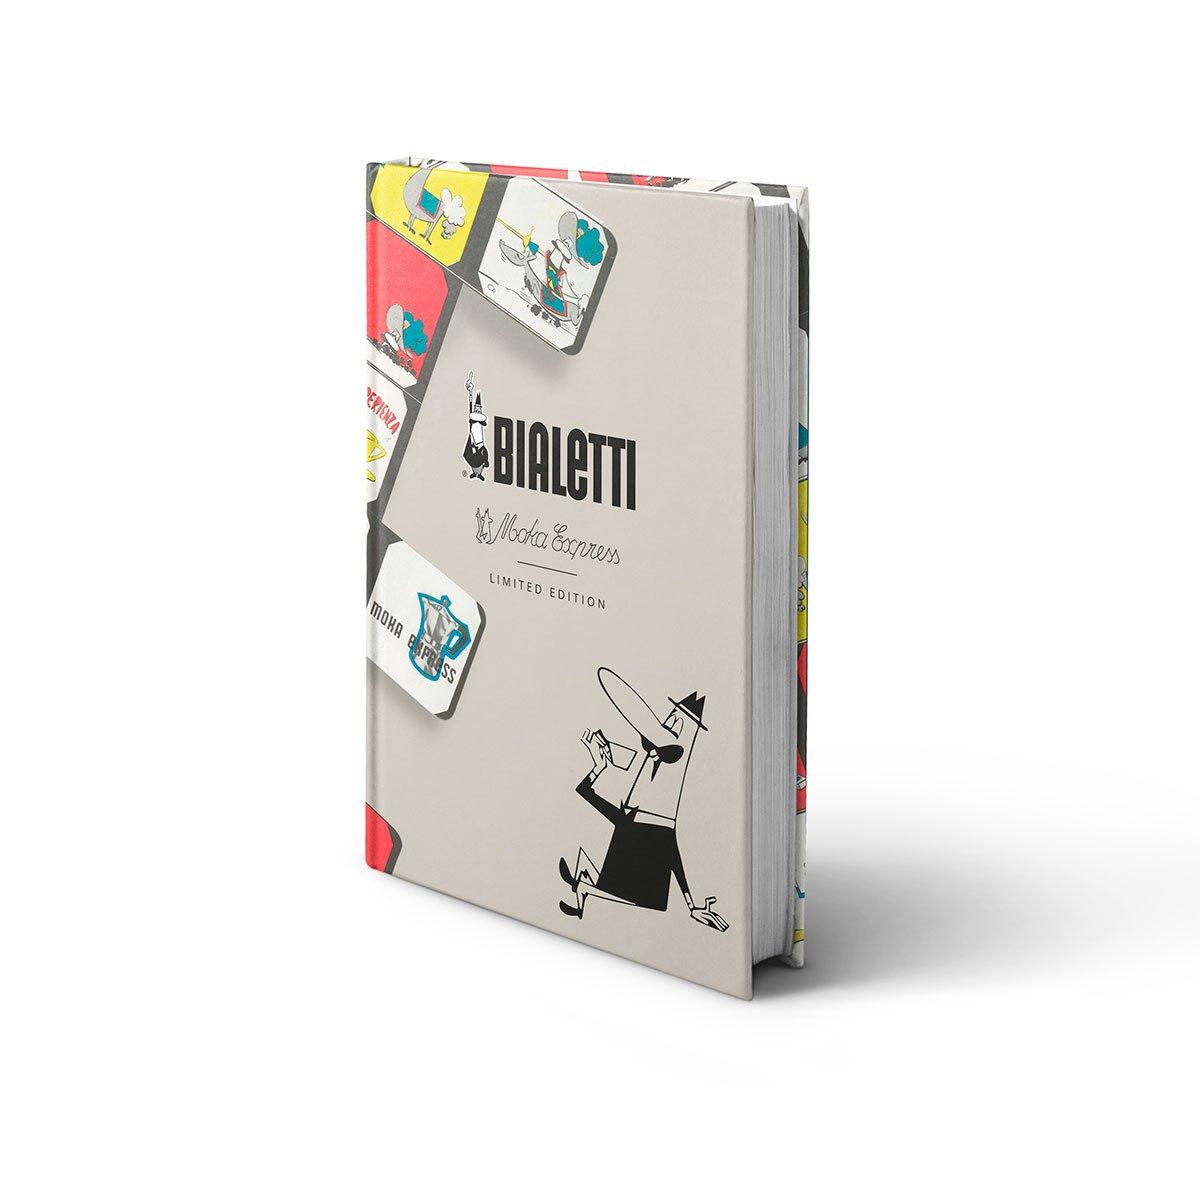 Agenda bialetti limited edition